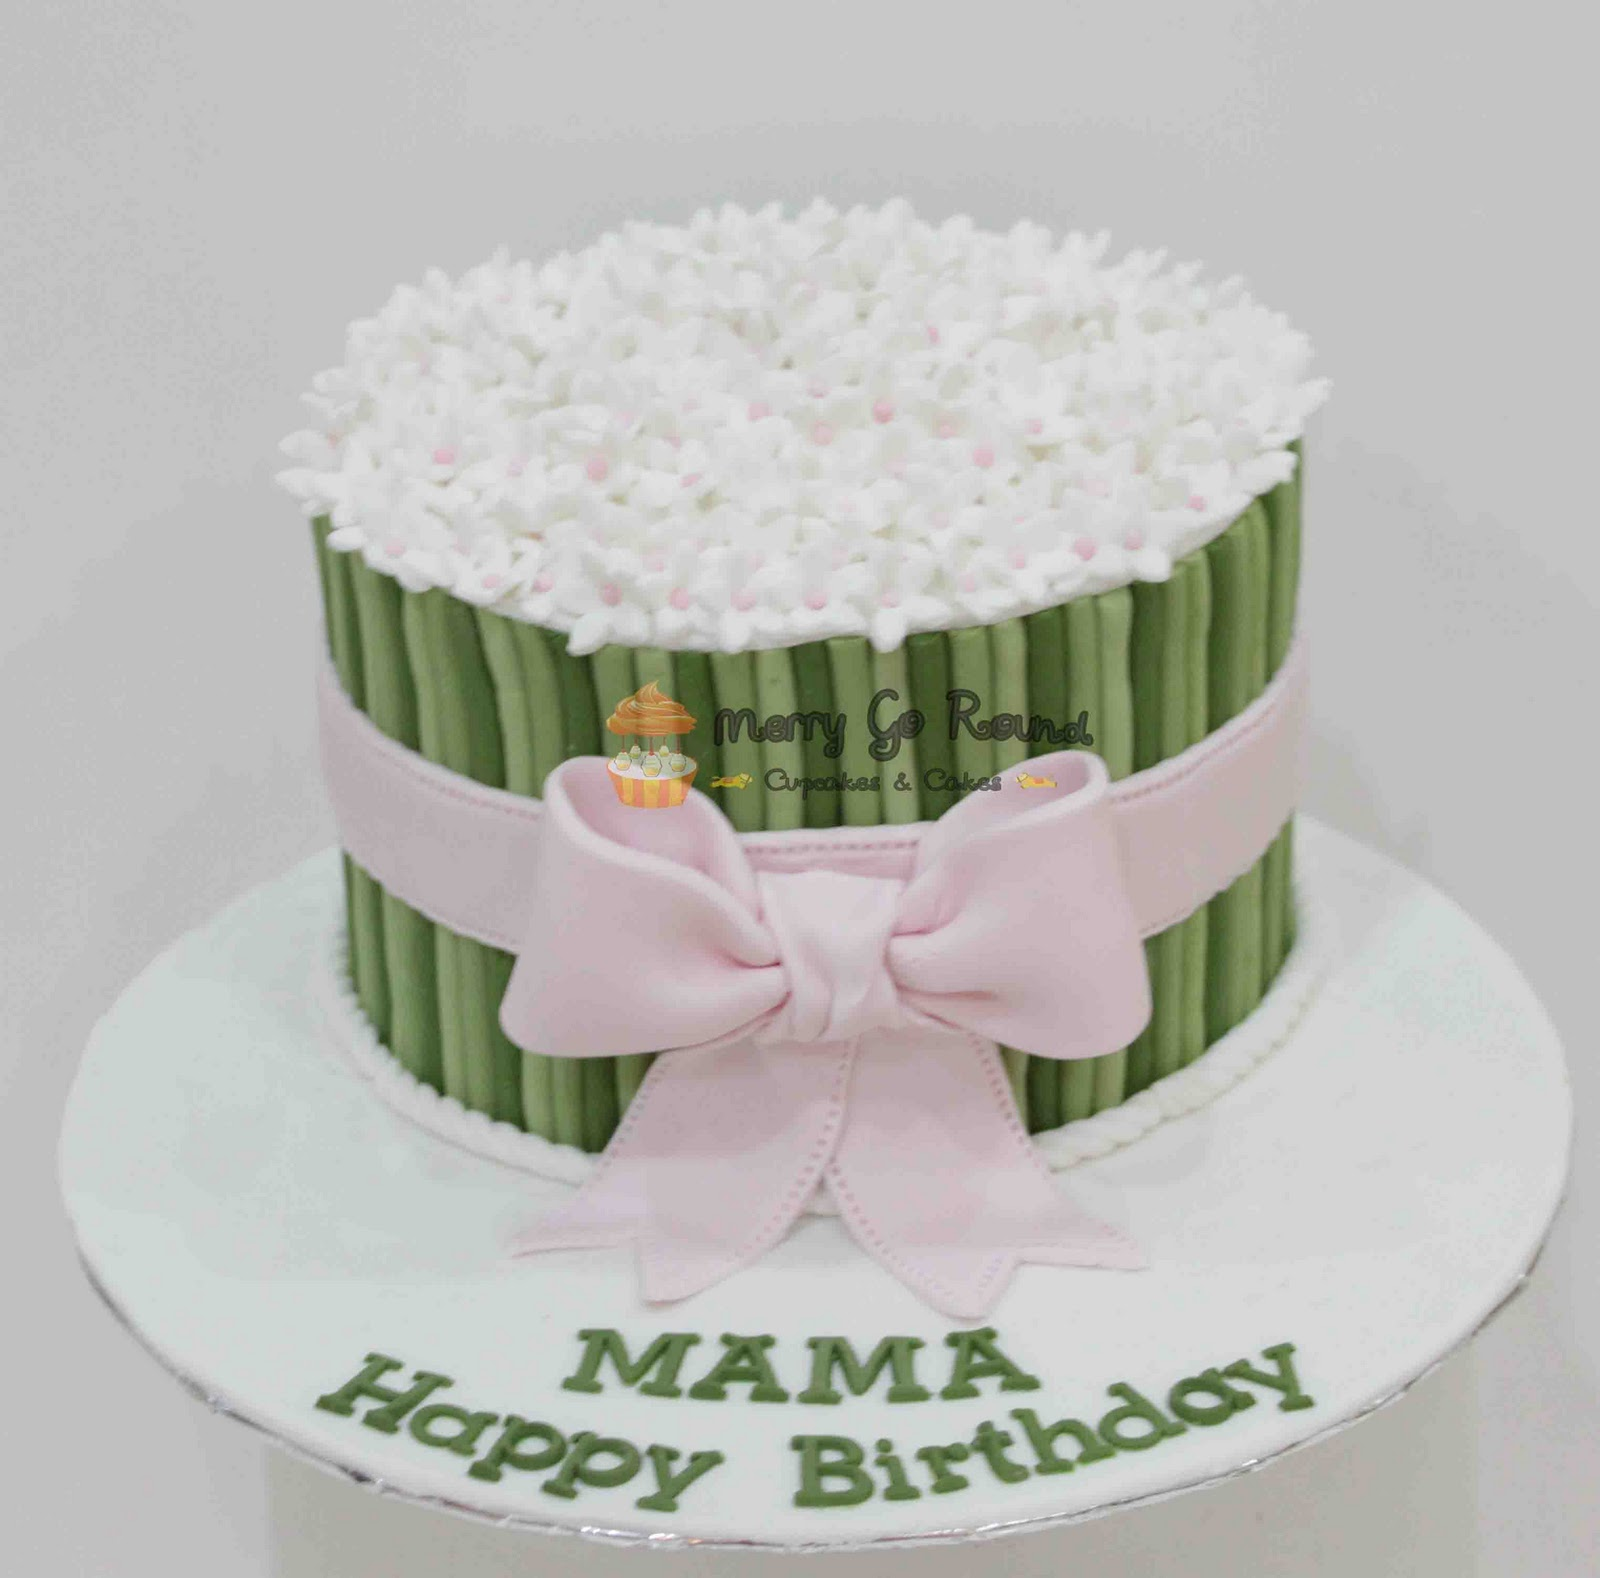 Merry go round cupcakes cakes pink white flower bouquet pink white flower bouquet izmirmasajfo